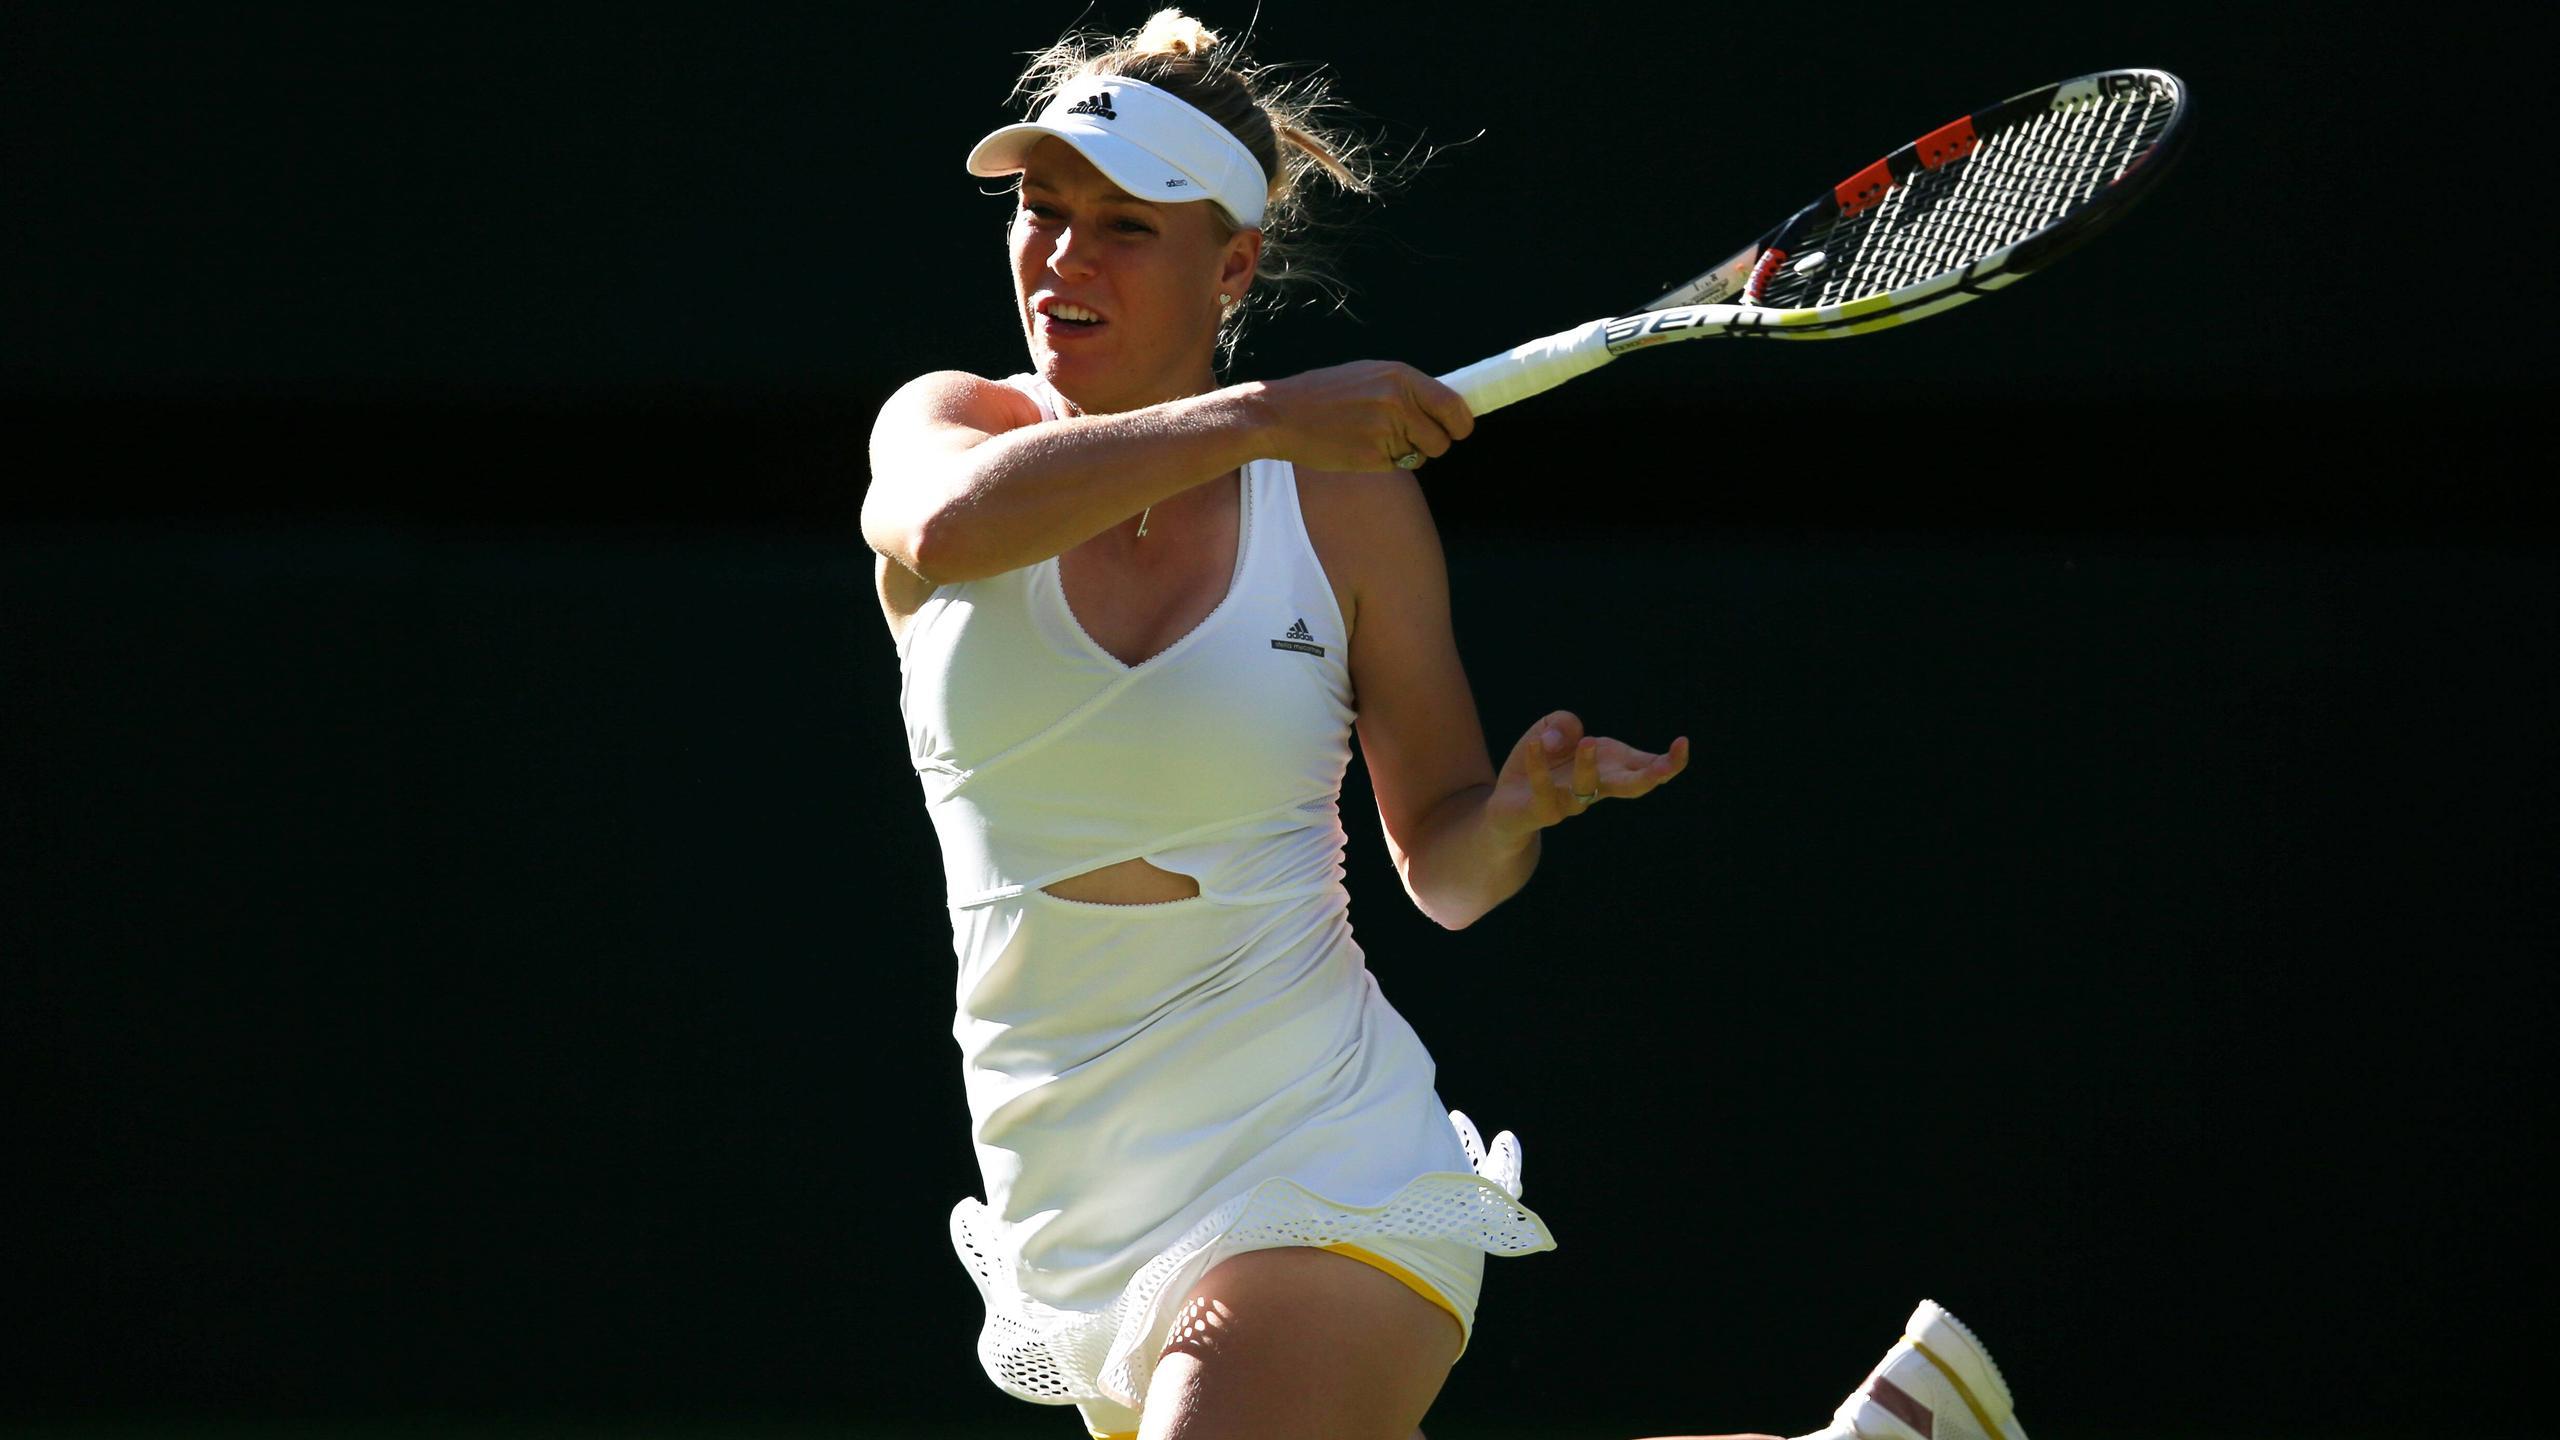 Caroline Wozniacki in action at Wimbledon